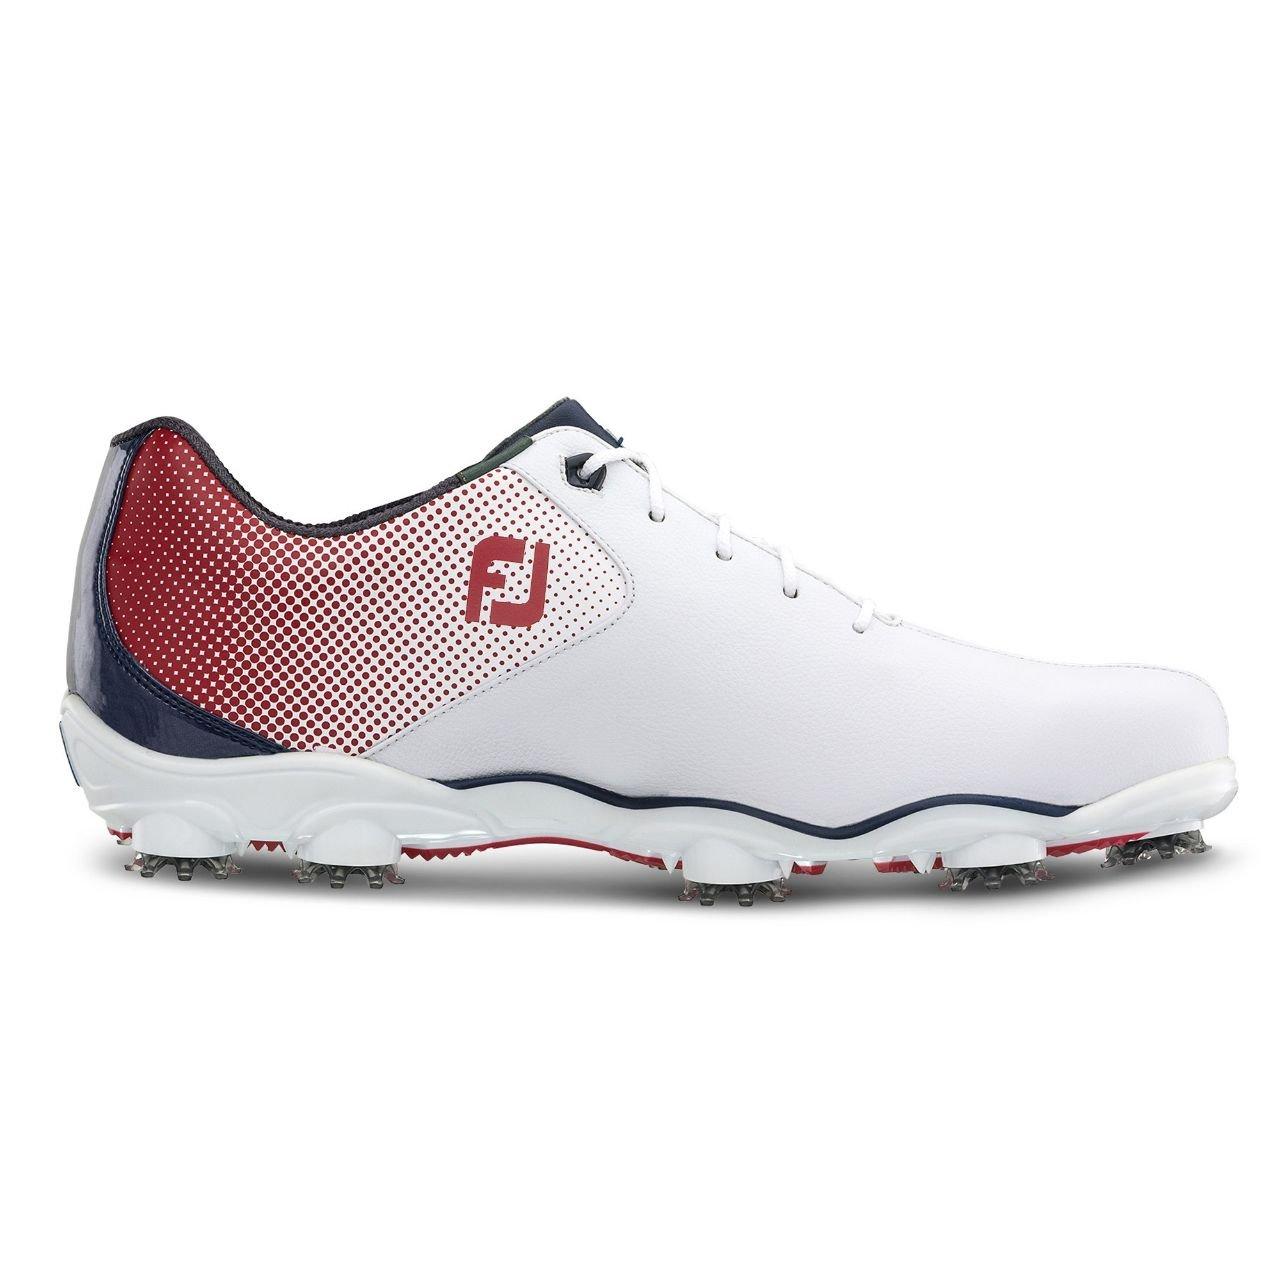 Footjoy D.N.A Helix Schuh Herren weiß rot blau